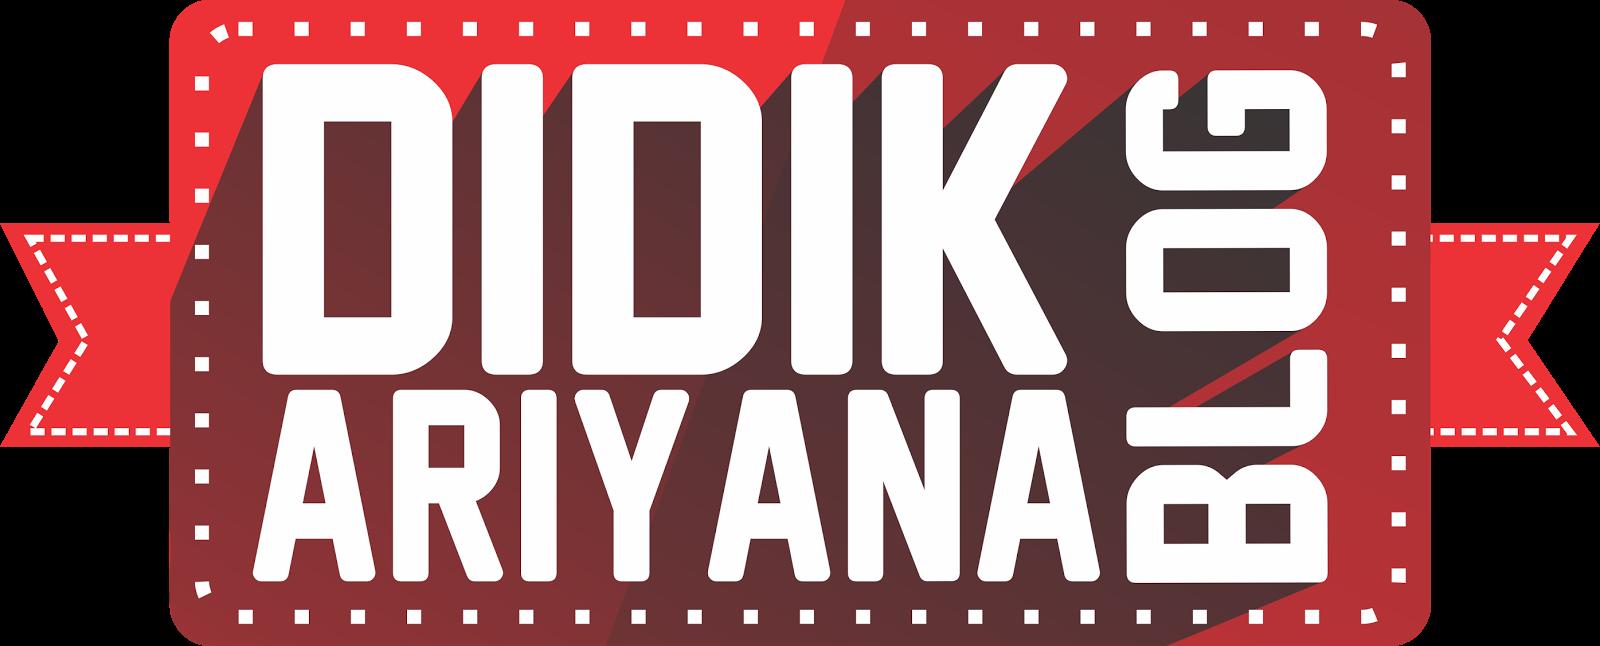 Didik Ariyana